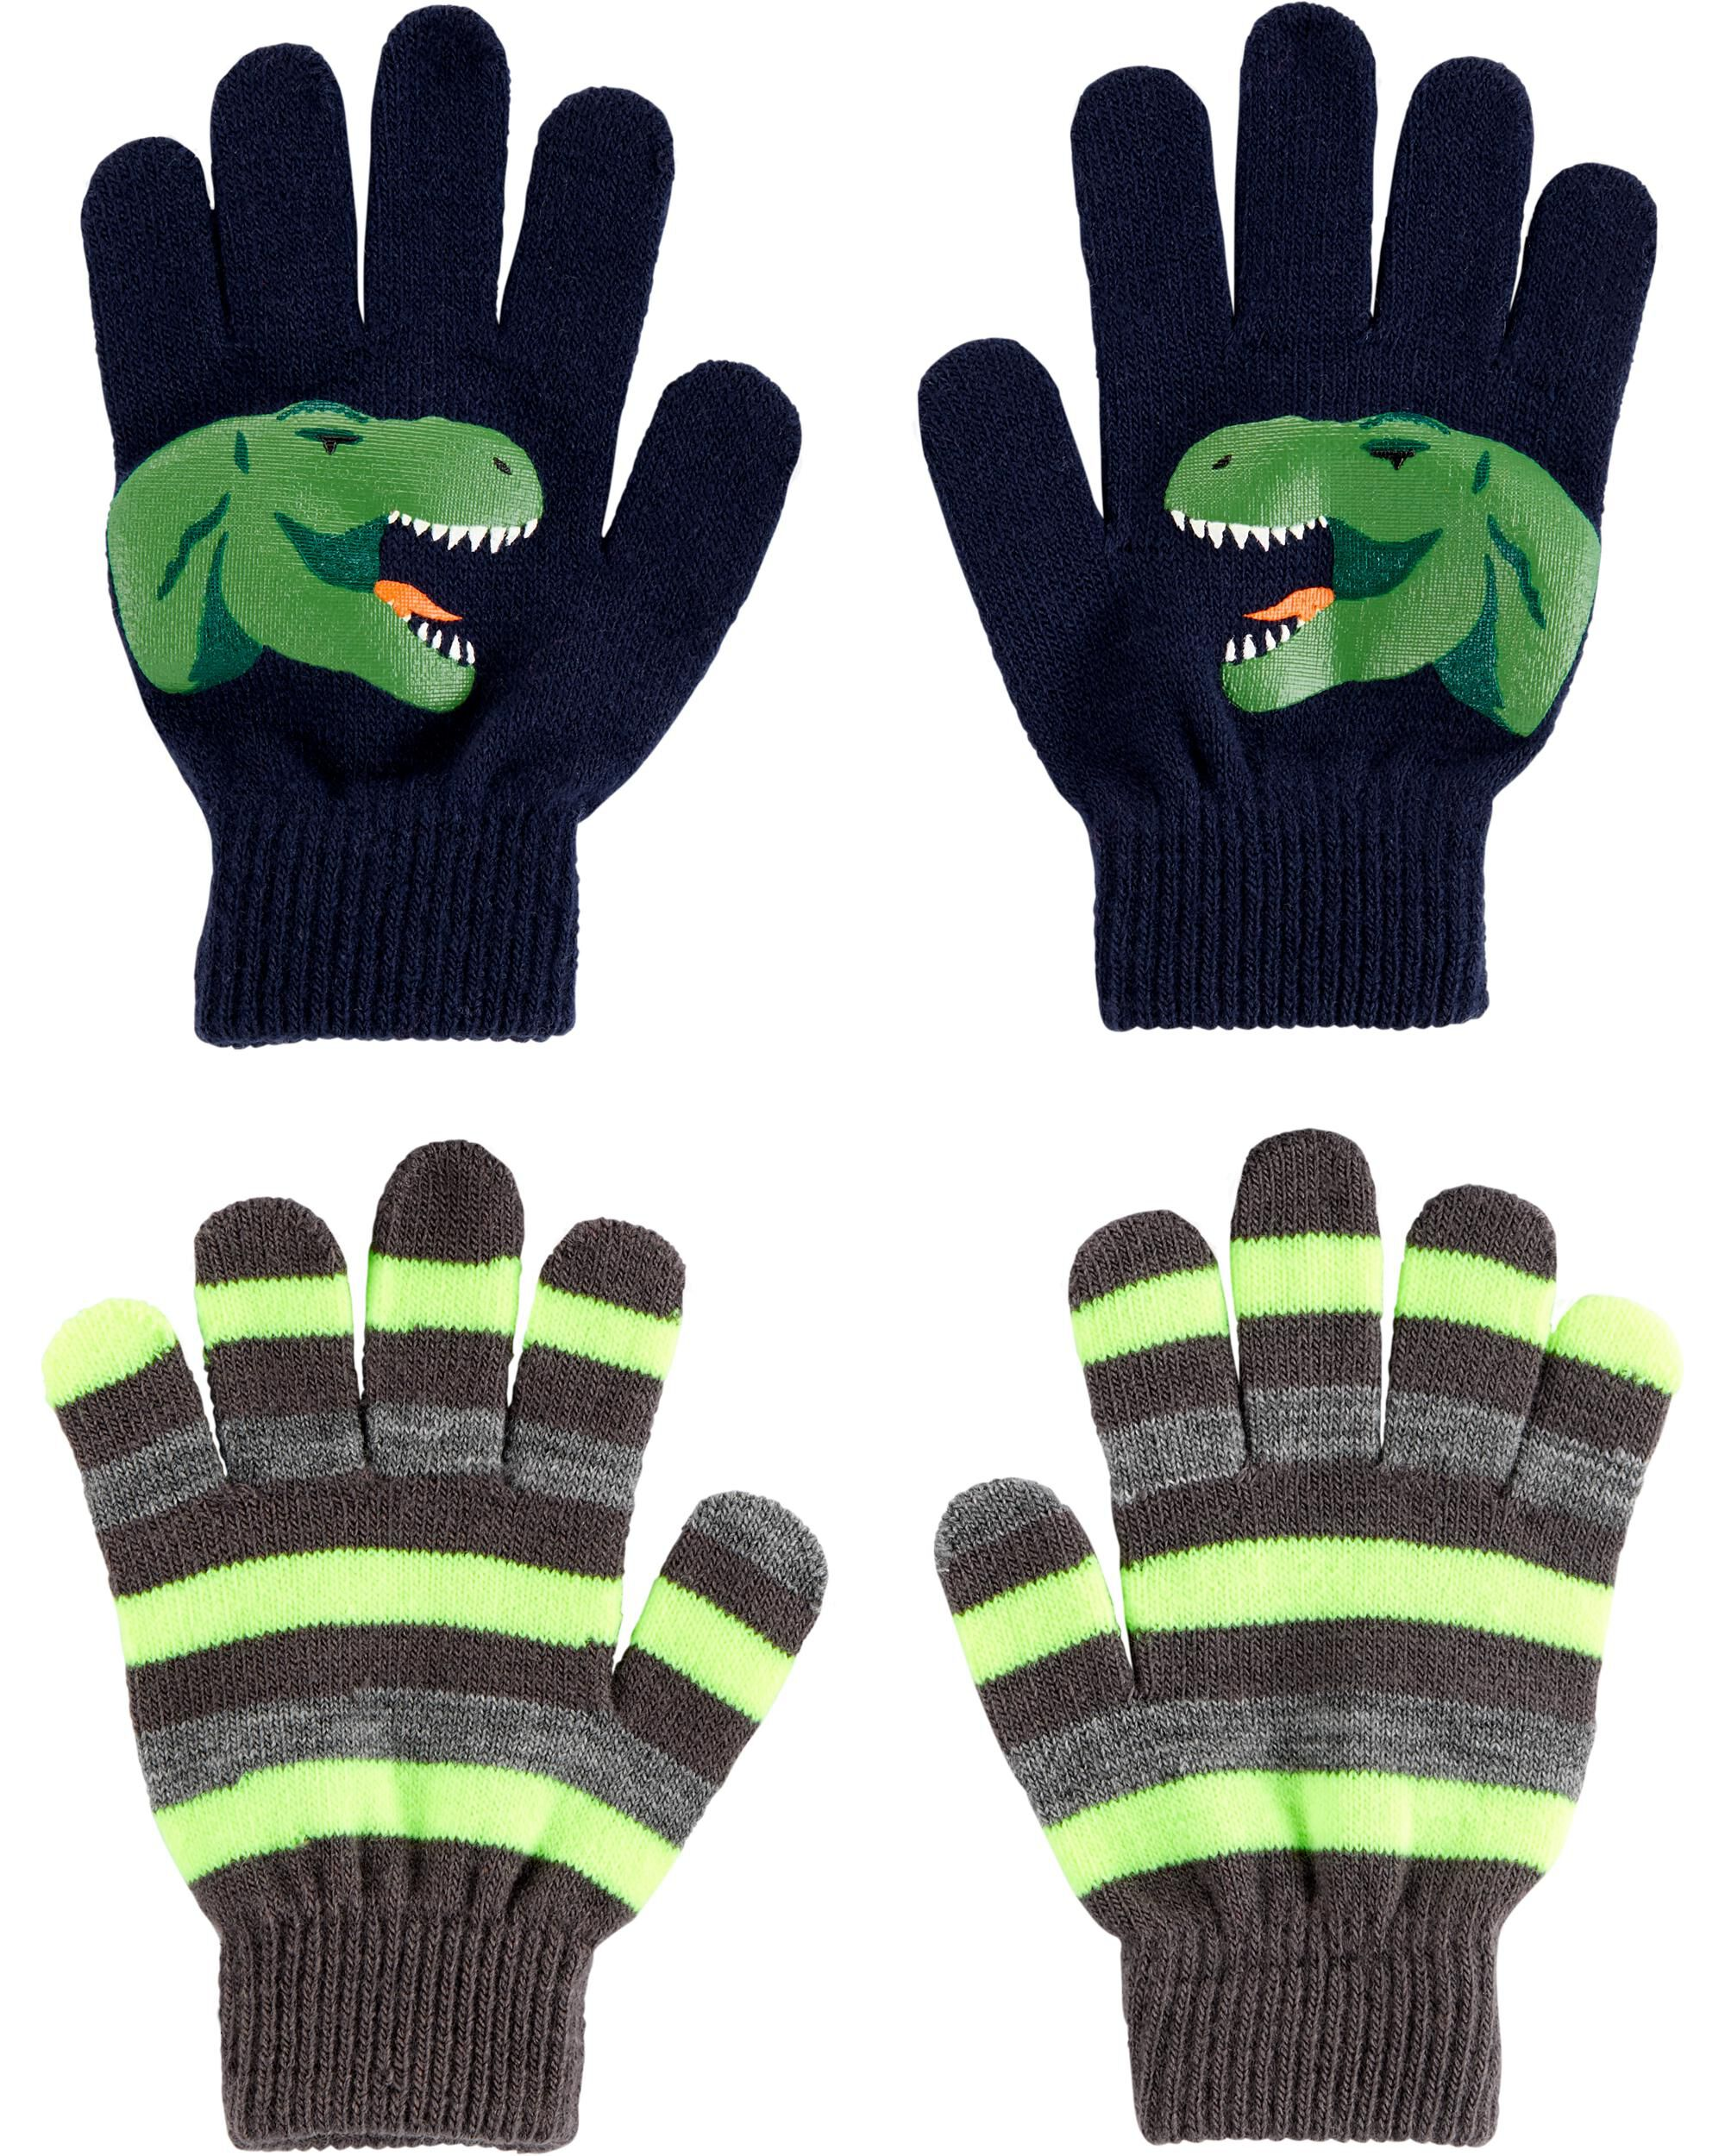 *DOORBUSTER*2-Pack Glow-In-The-Dark Dinosaur Gloves